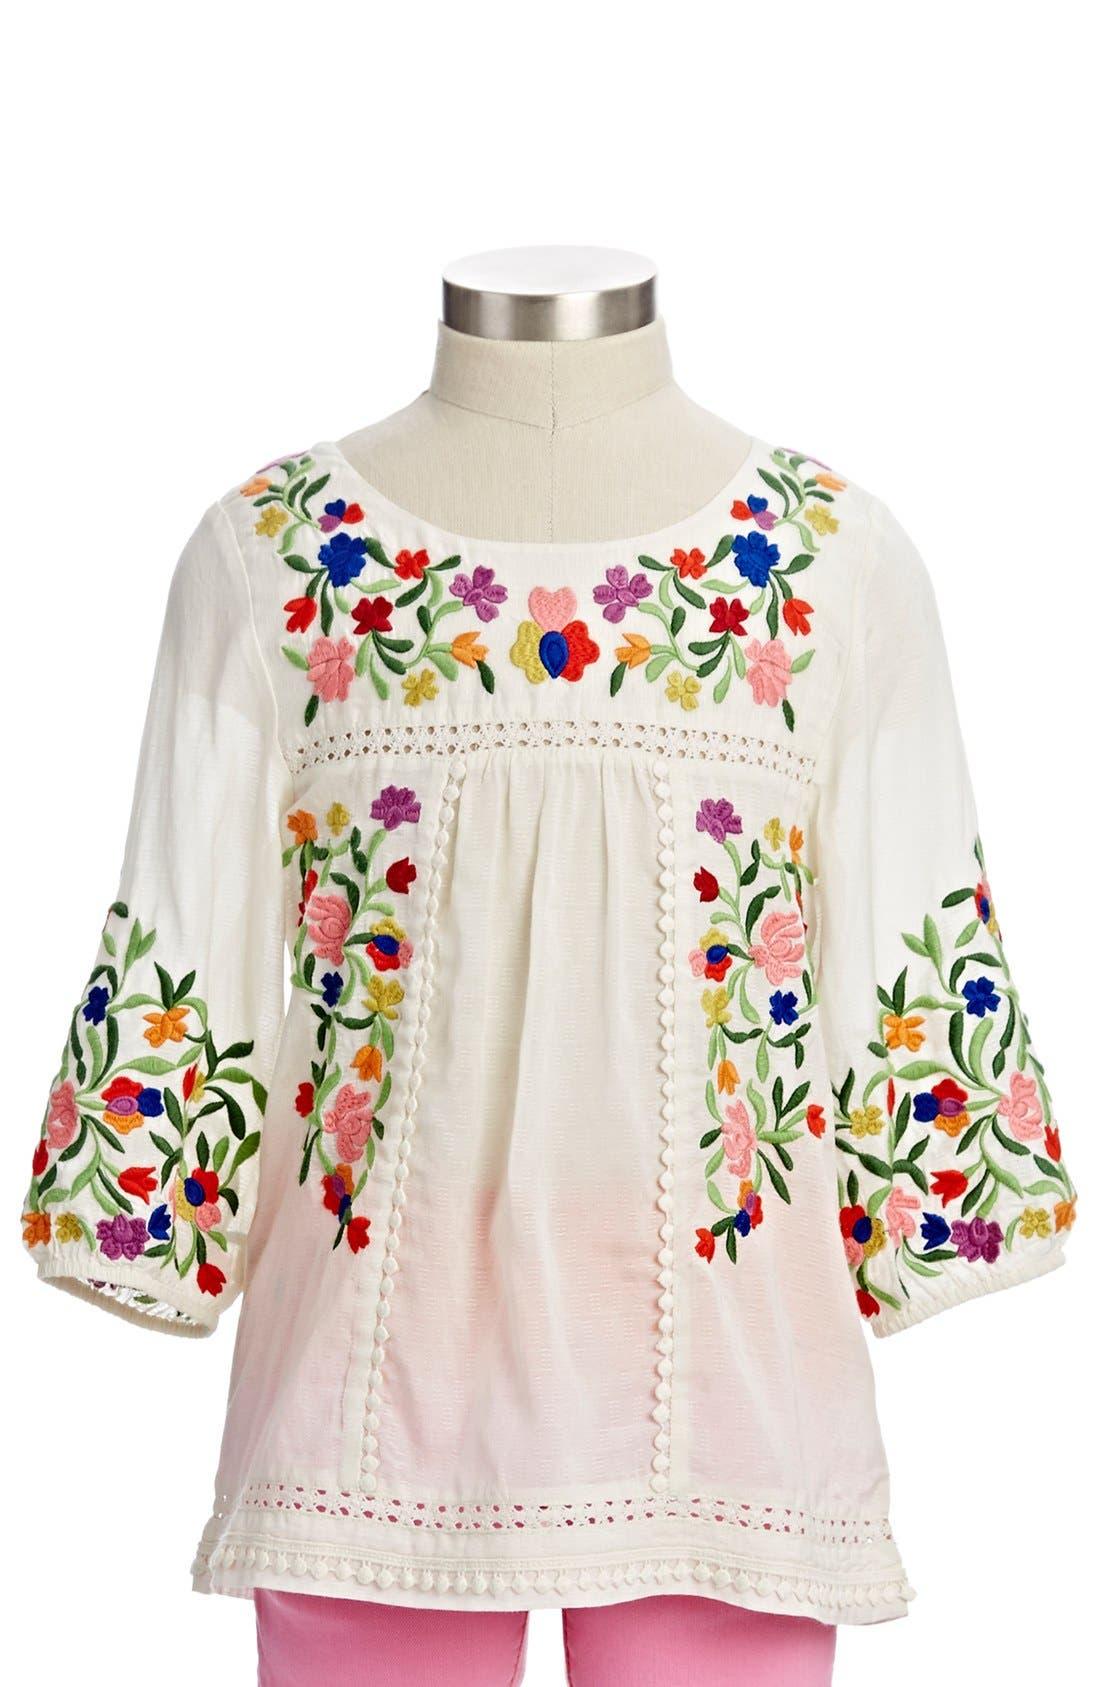 Alternate Image 1 Selected - Peek 'Marin' Embroidered Peasant Top (Toddler Girls, Little Girls & Big Girls)